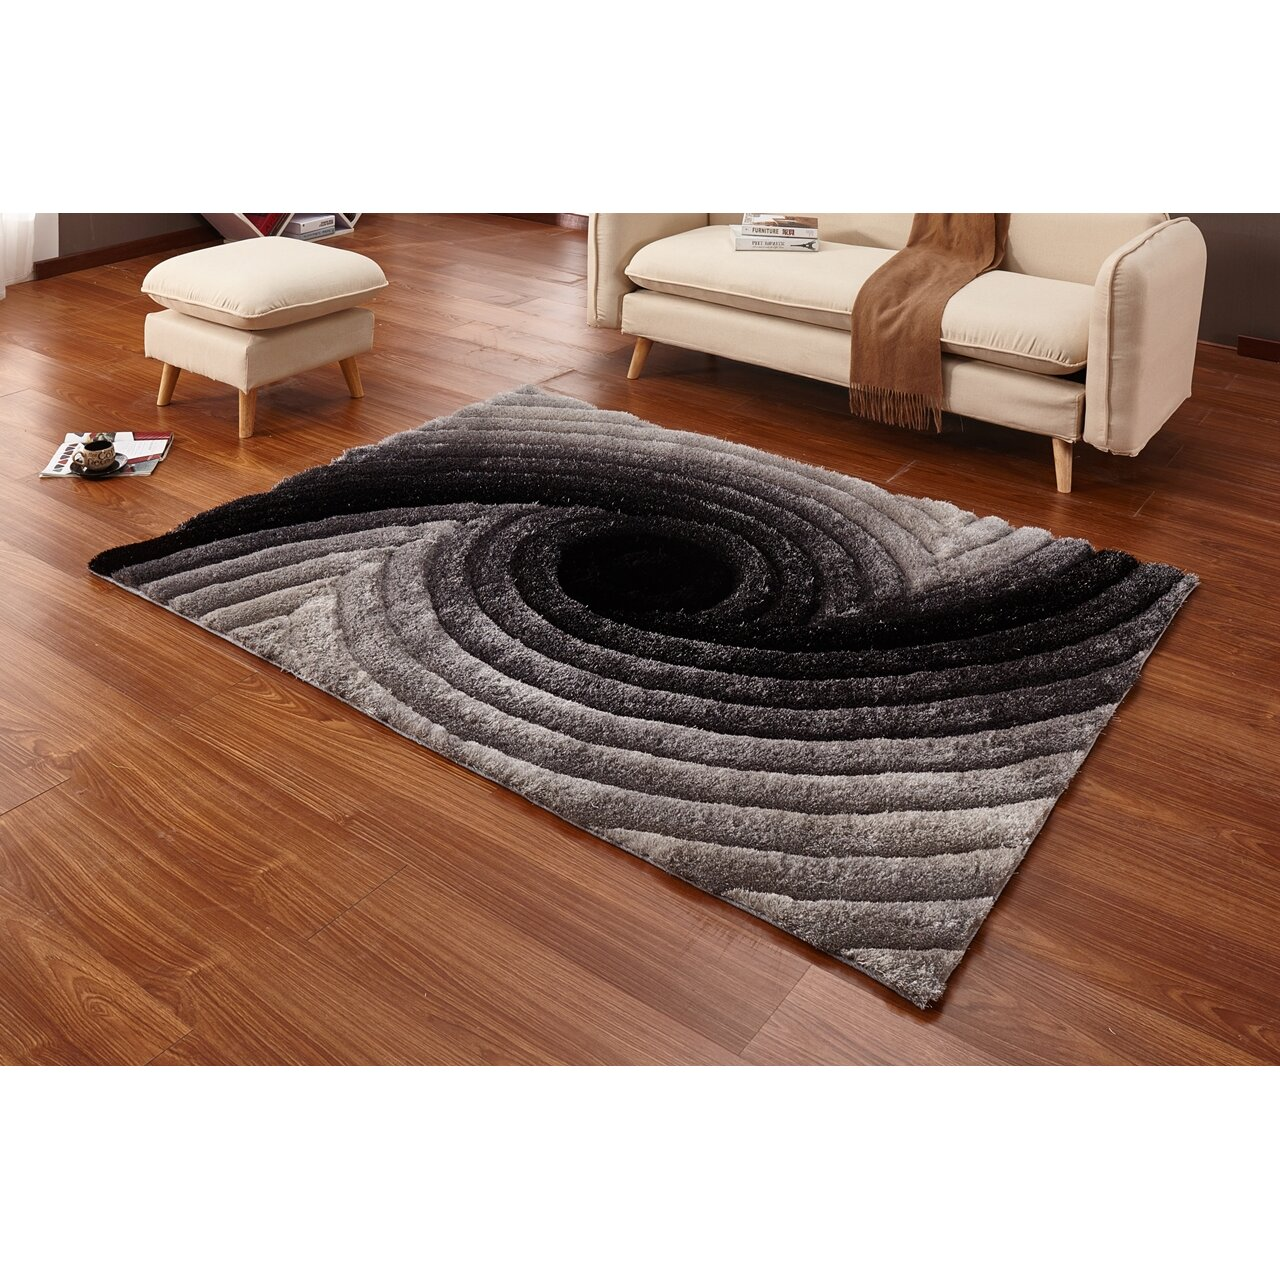 Rugs Furniture: Casamode Functional Furniture Regina Gray/Black Area Rug